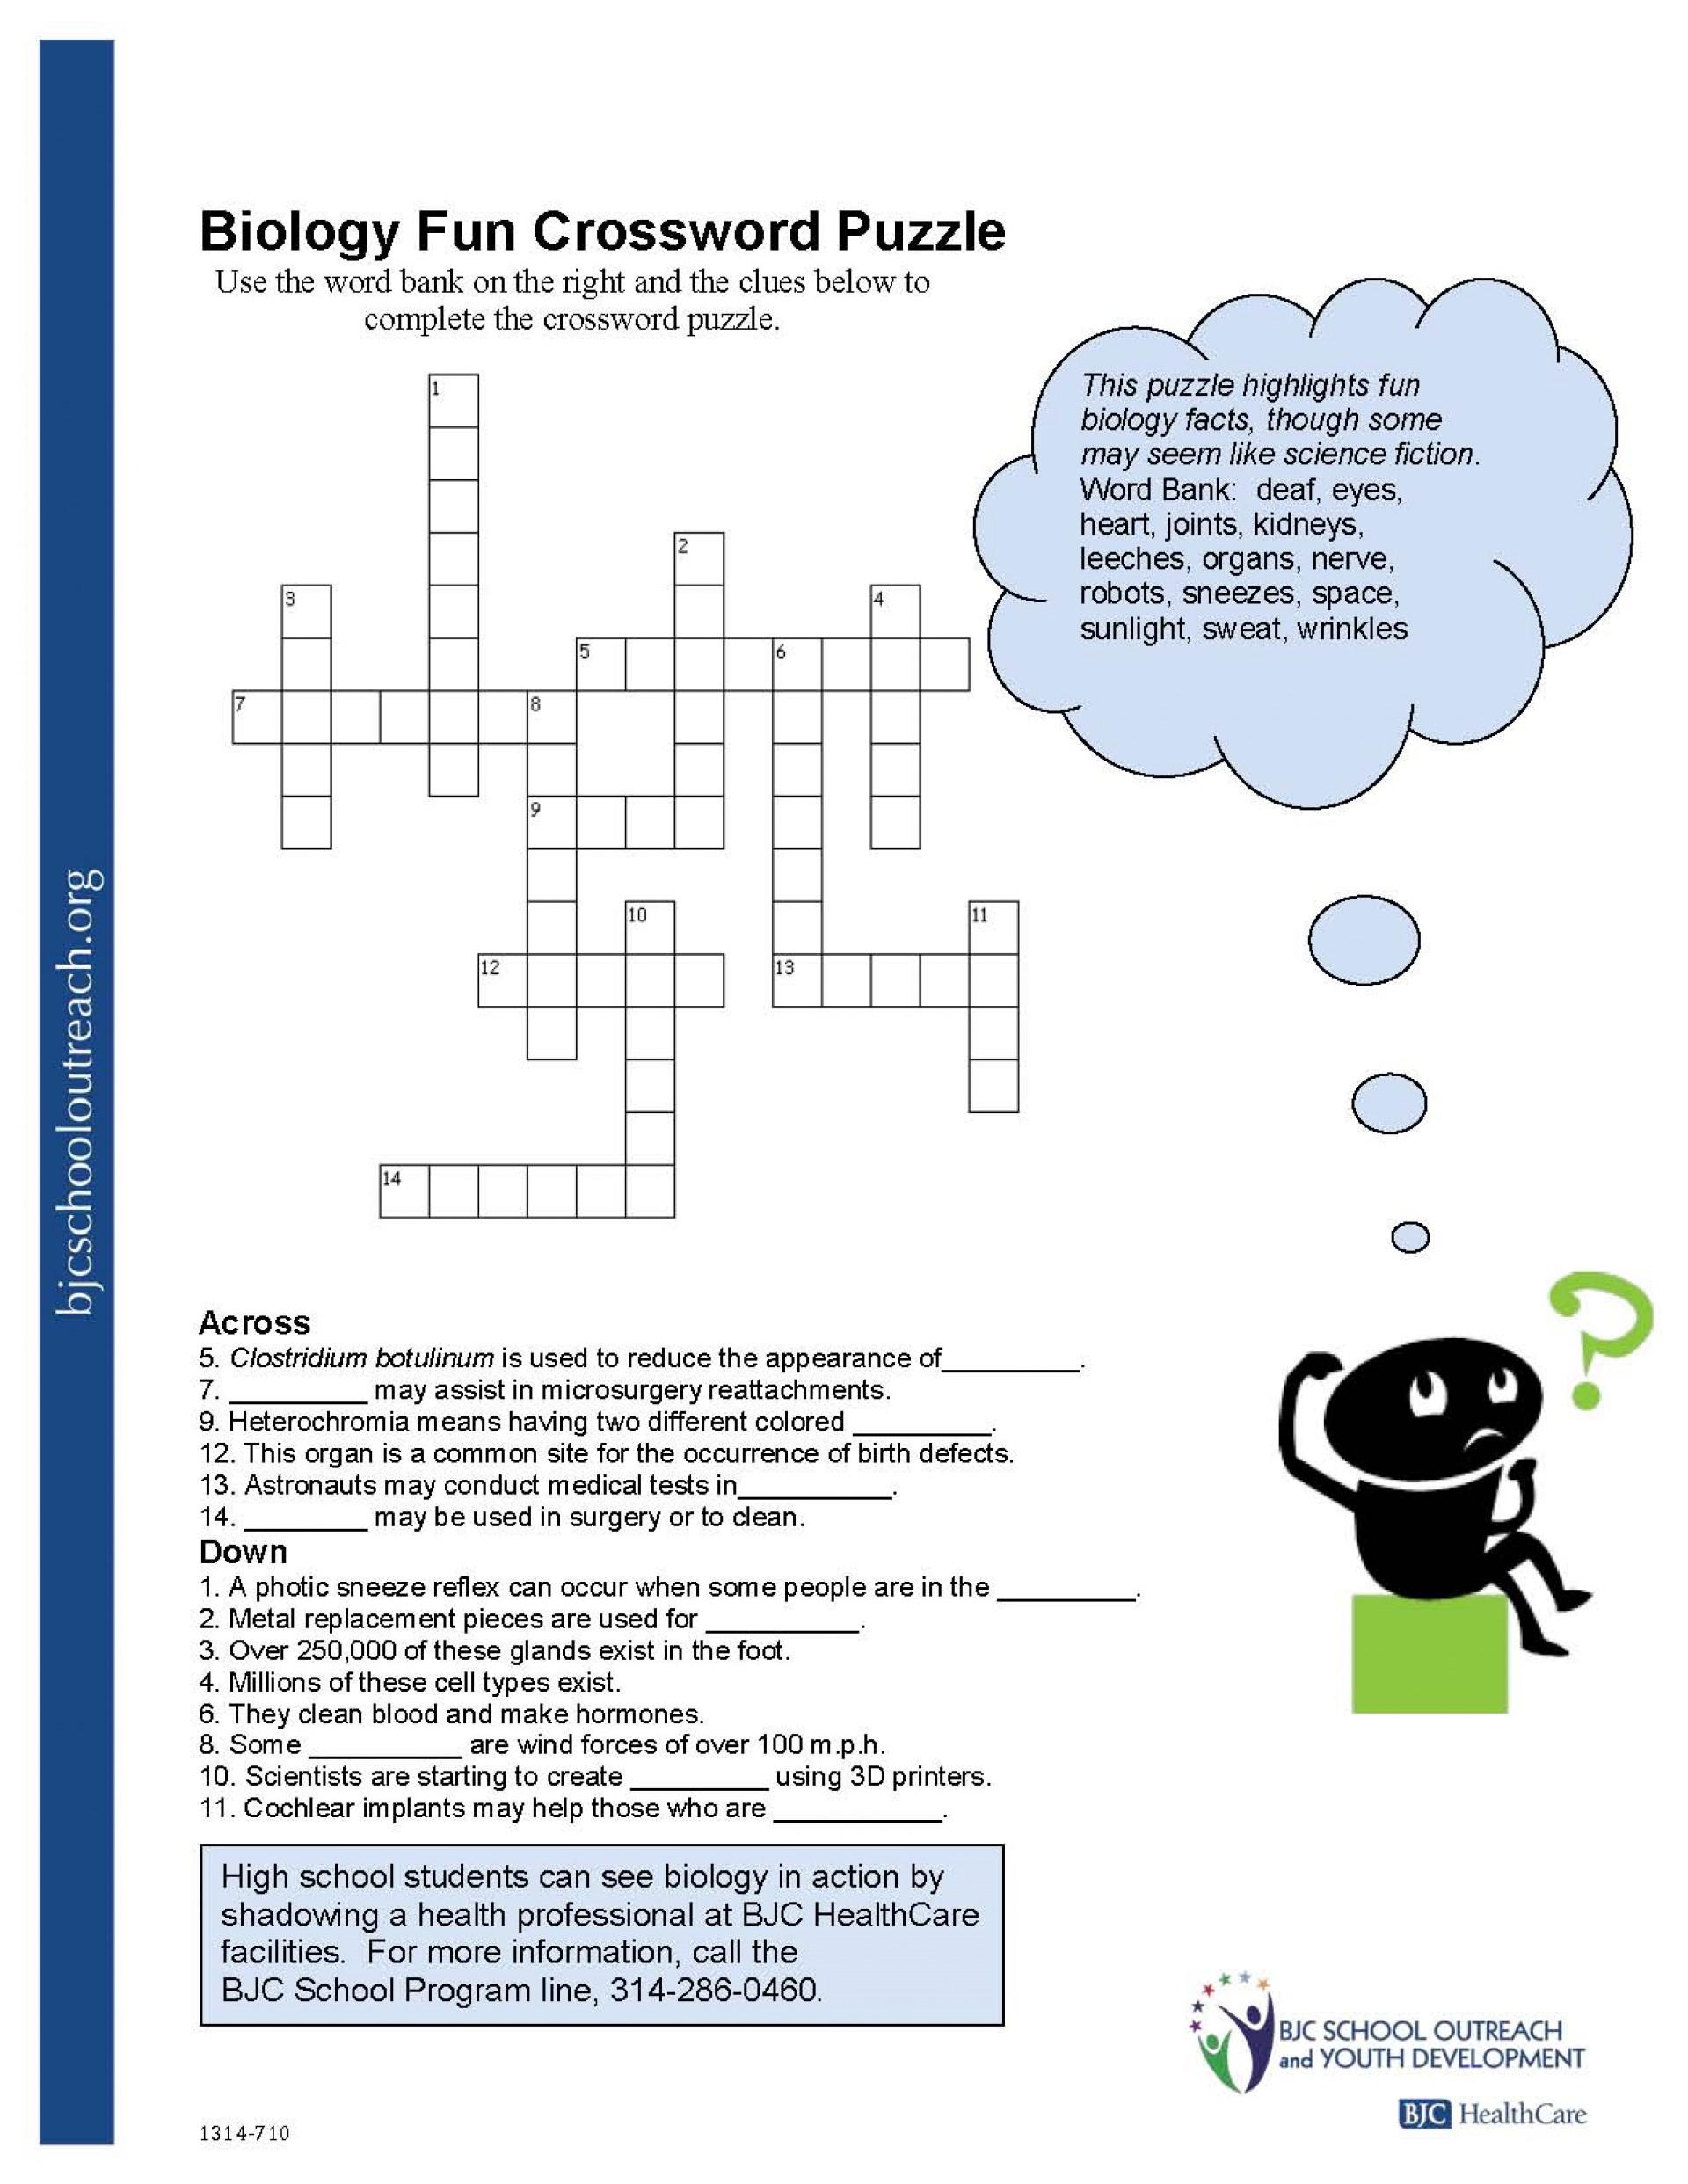 Crosswords Crossword Puzzle Worksheets For Middle School Biology Fun - Printable Worksheets Crossword Puzzles